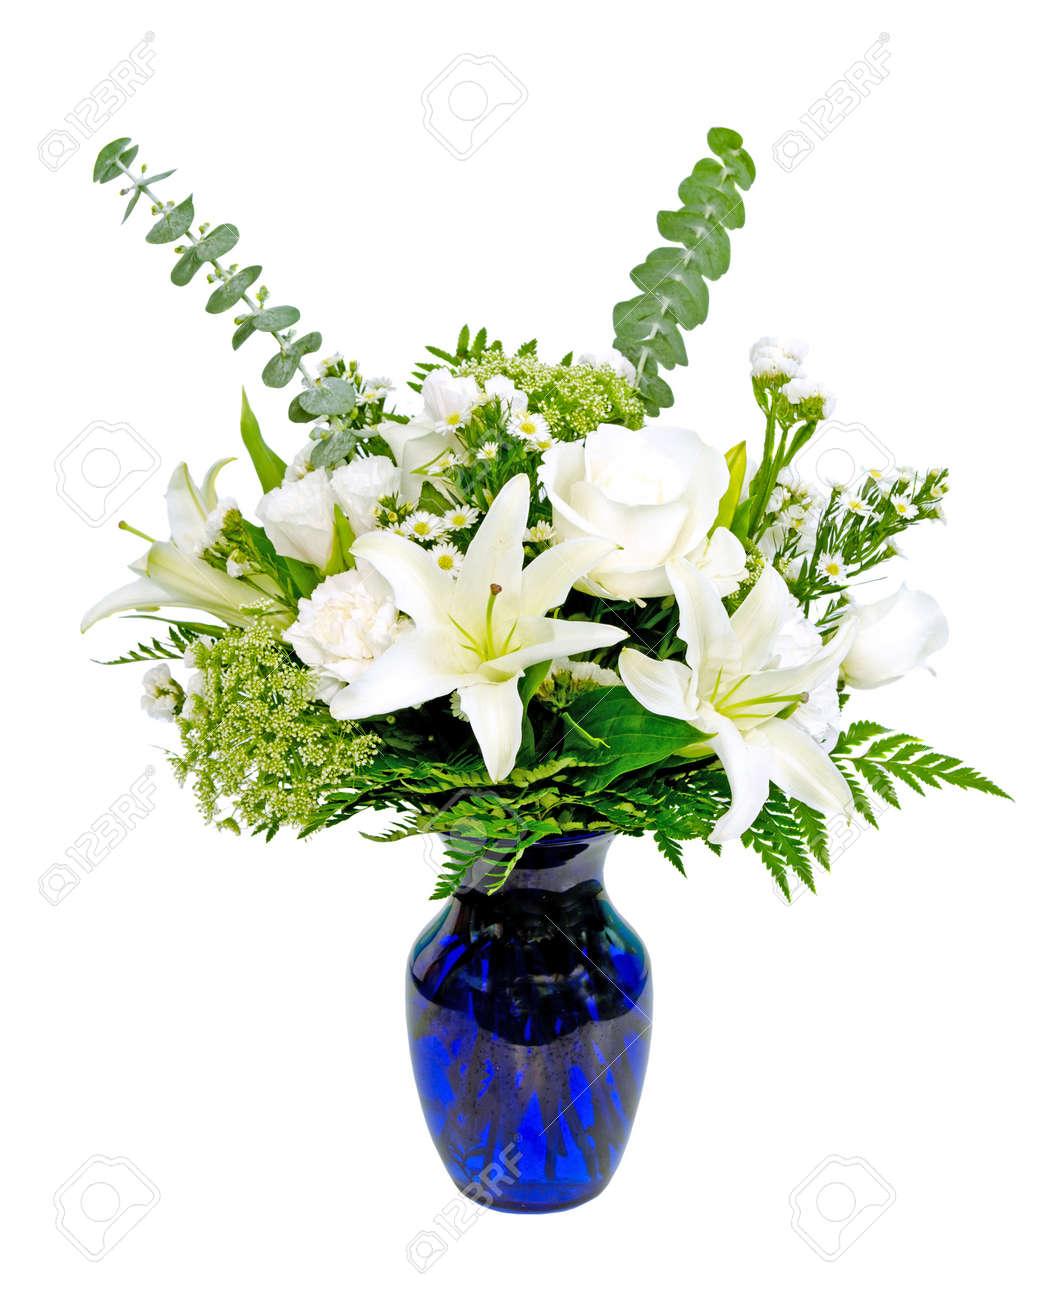 White And Green Flower Arrangement Centerpiece In Blue Vase With